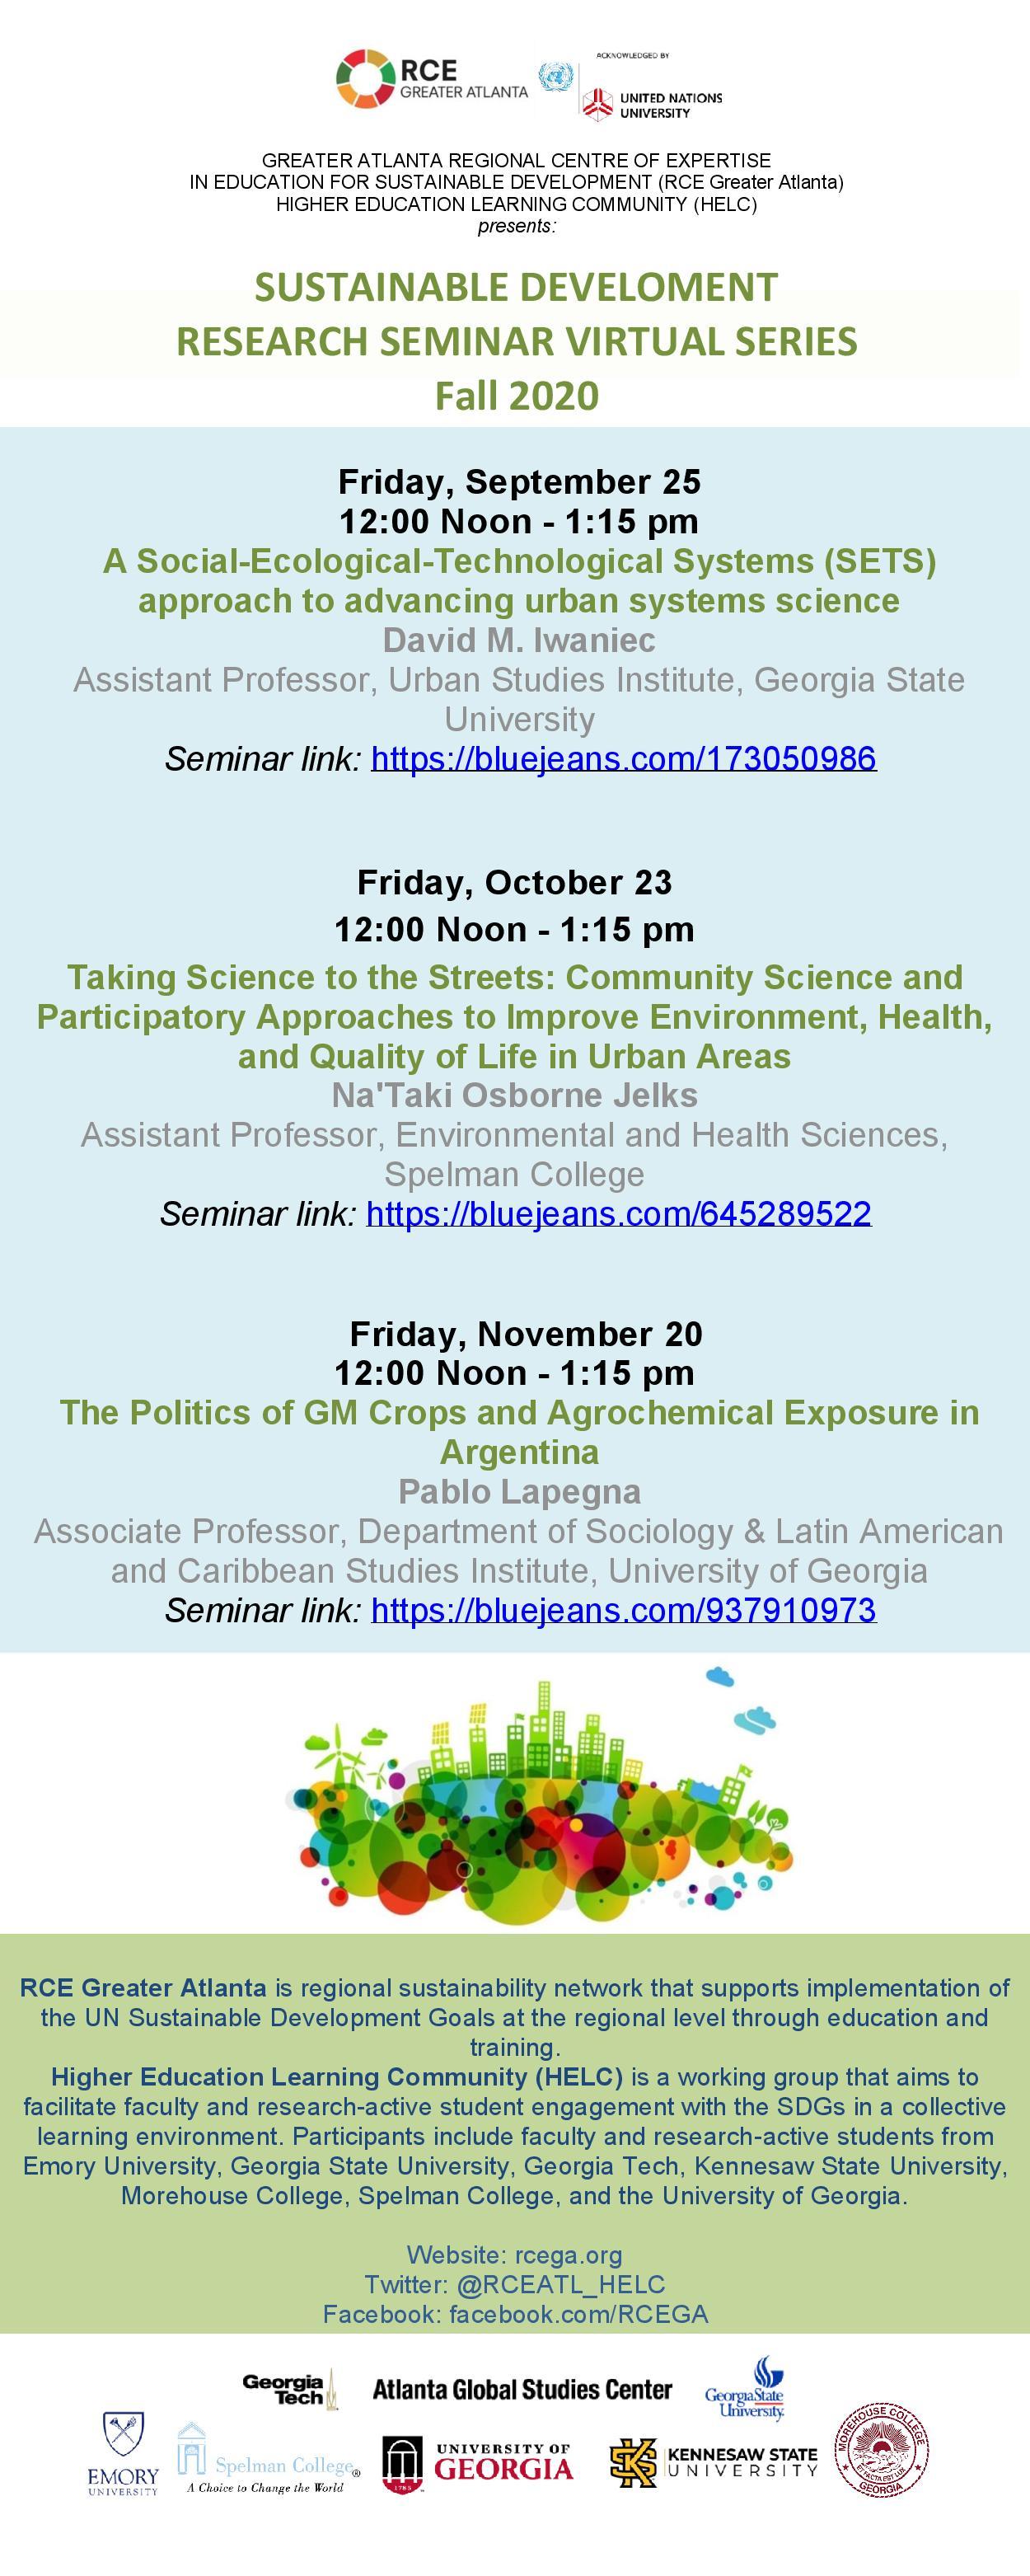 RCE-HELC-Research-Seminars-Calendar_Fall2020